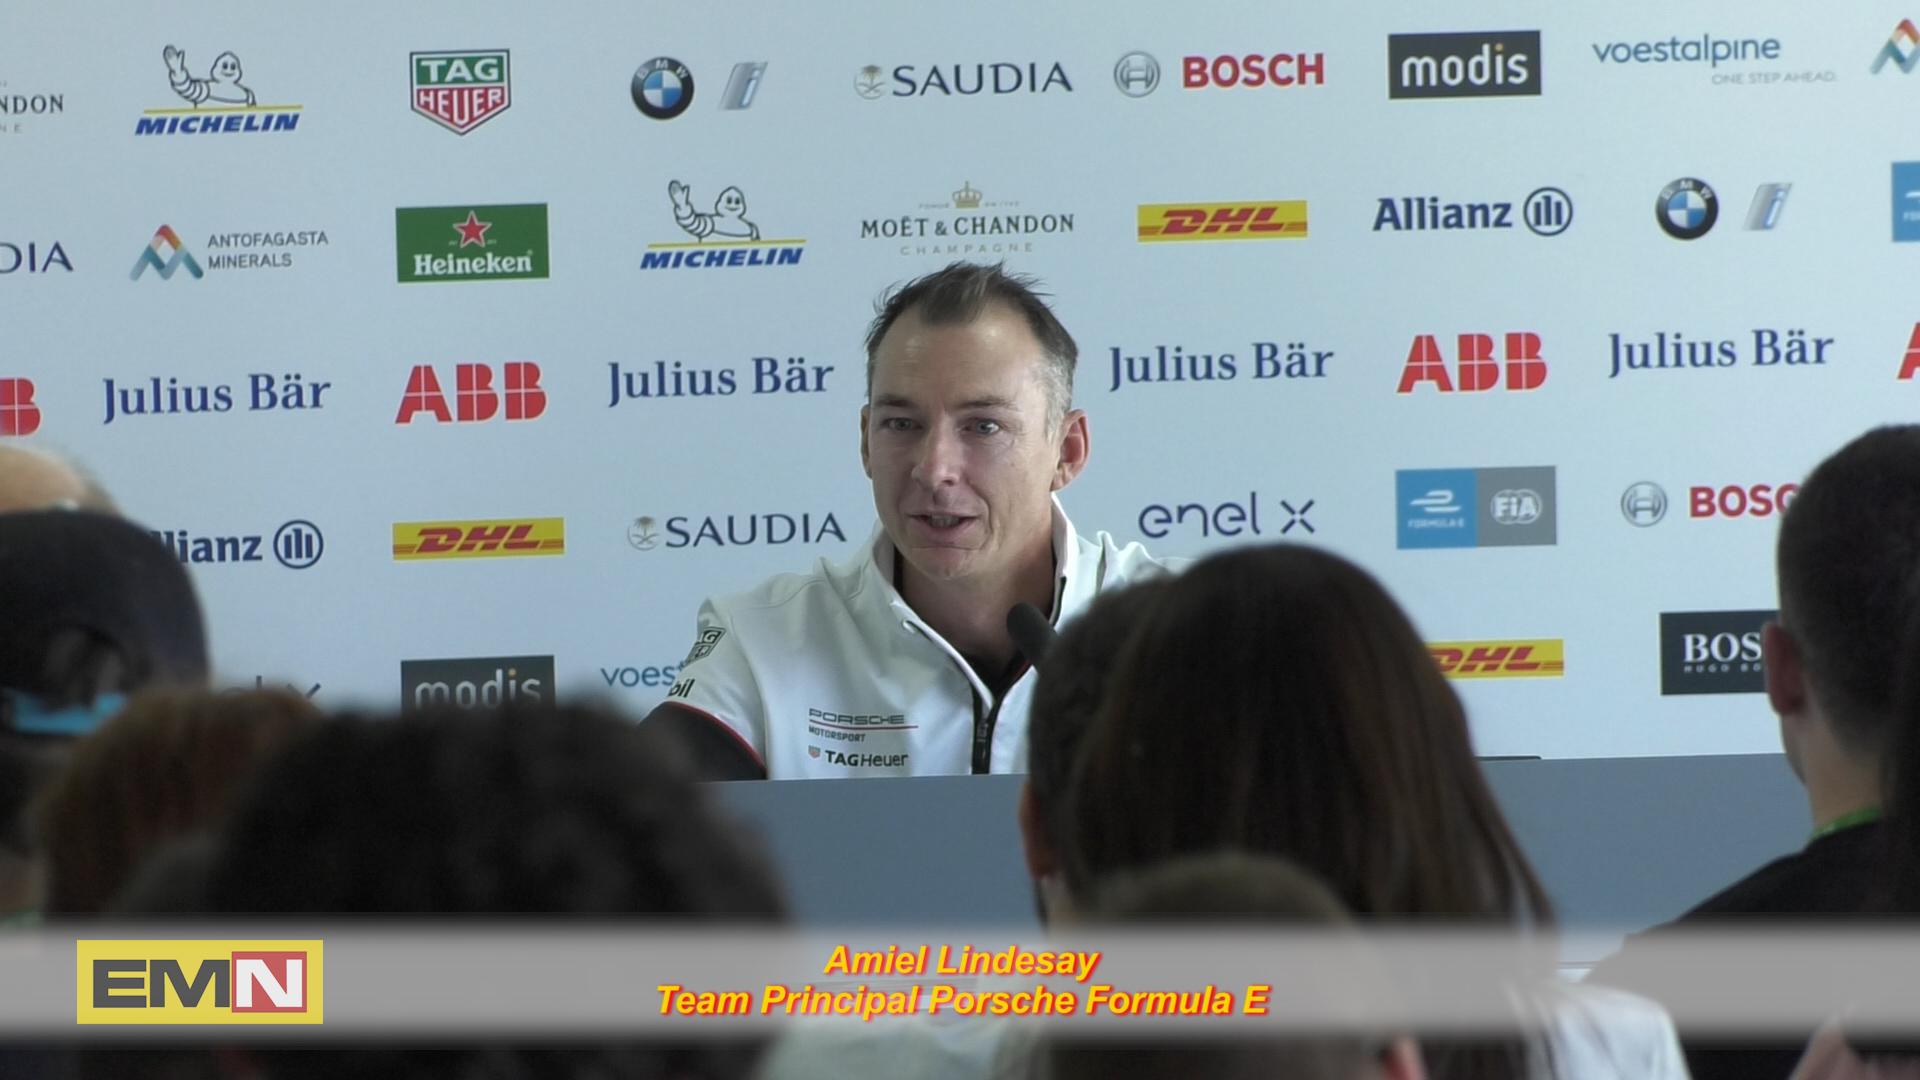 1-Press-Conference-Team-Principal-Porsche